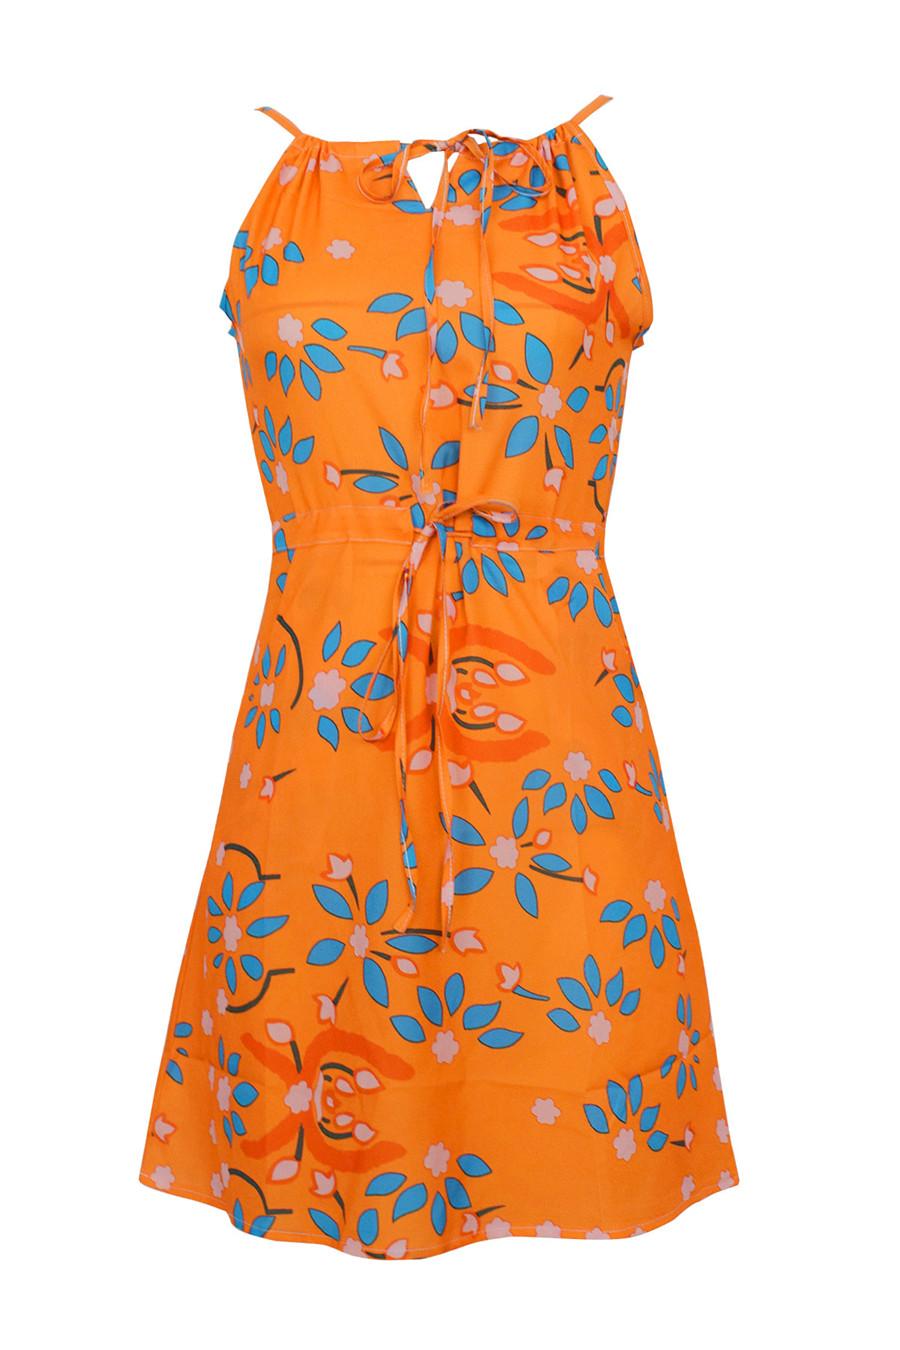 Gladiolus Chiffon Women Summer Dress Spaghetti Strap Floral Print Pocket Sexy Bohemian Beach Dress 2019 Short Ladies Dresses (15)